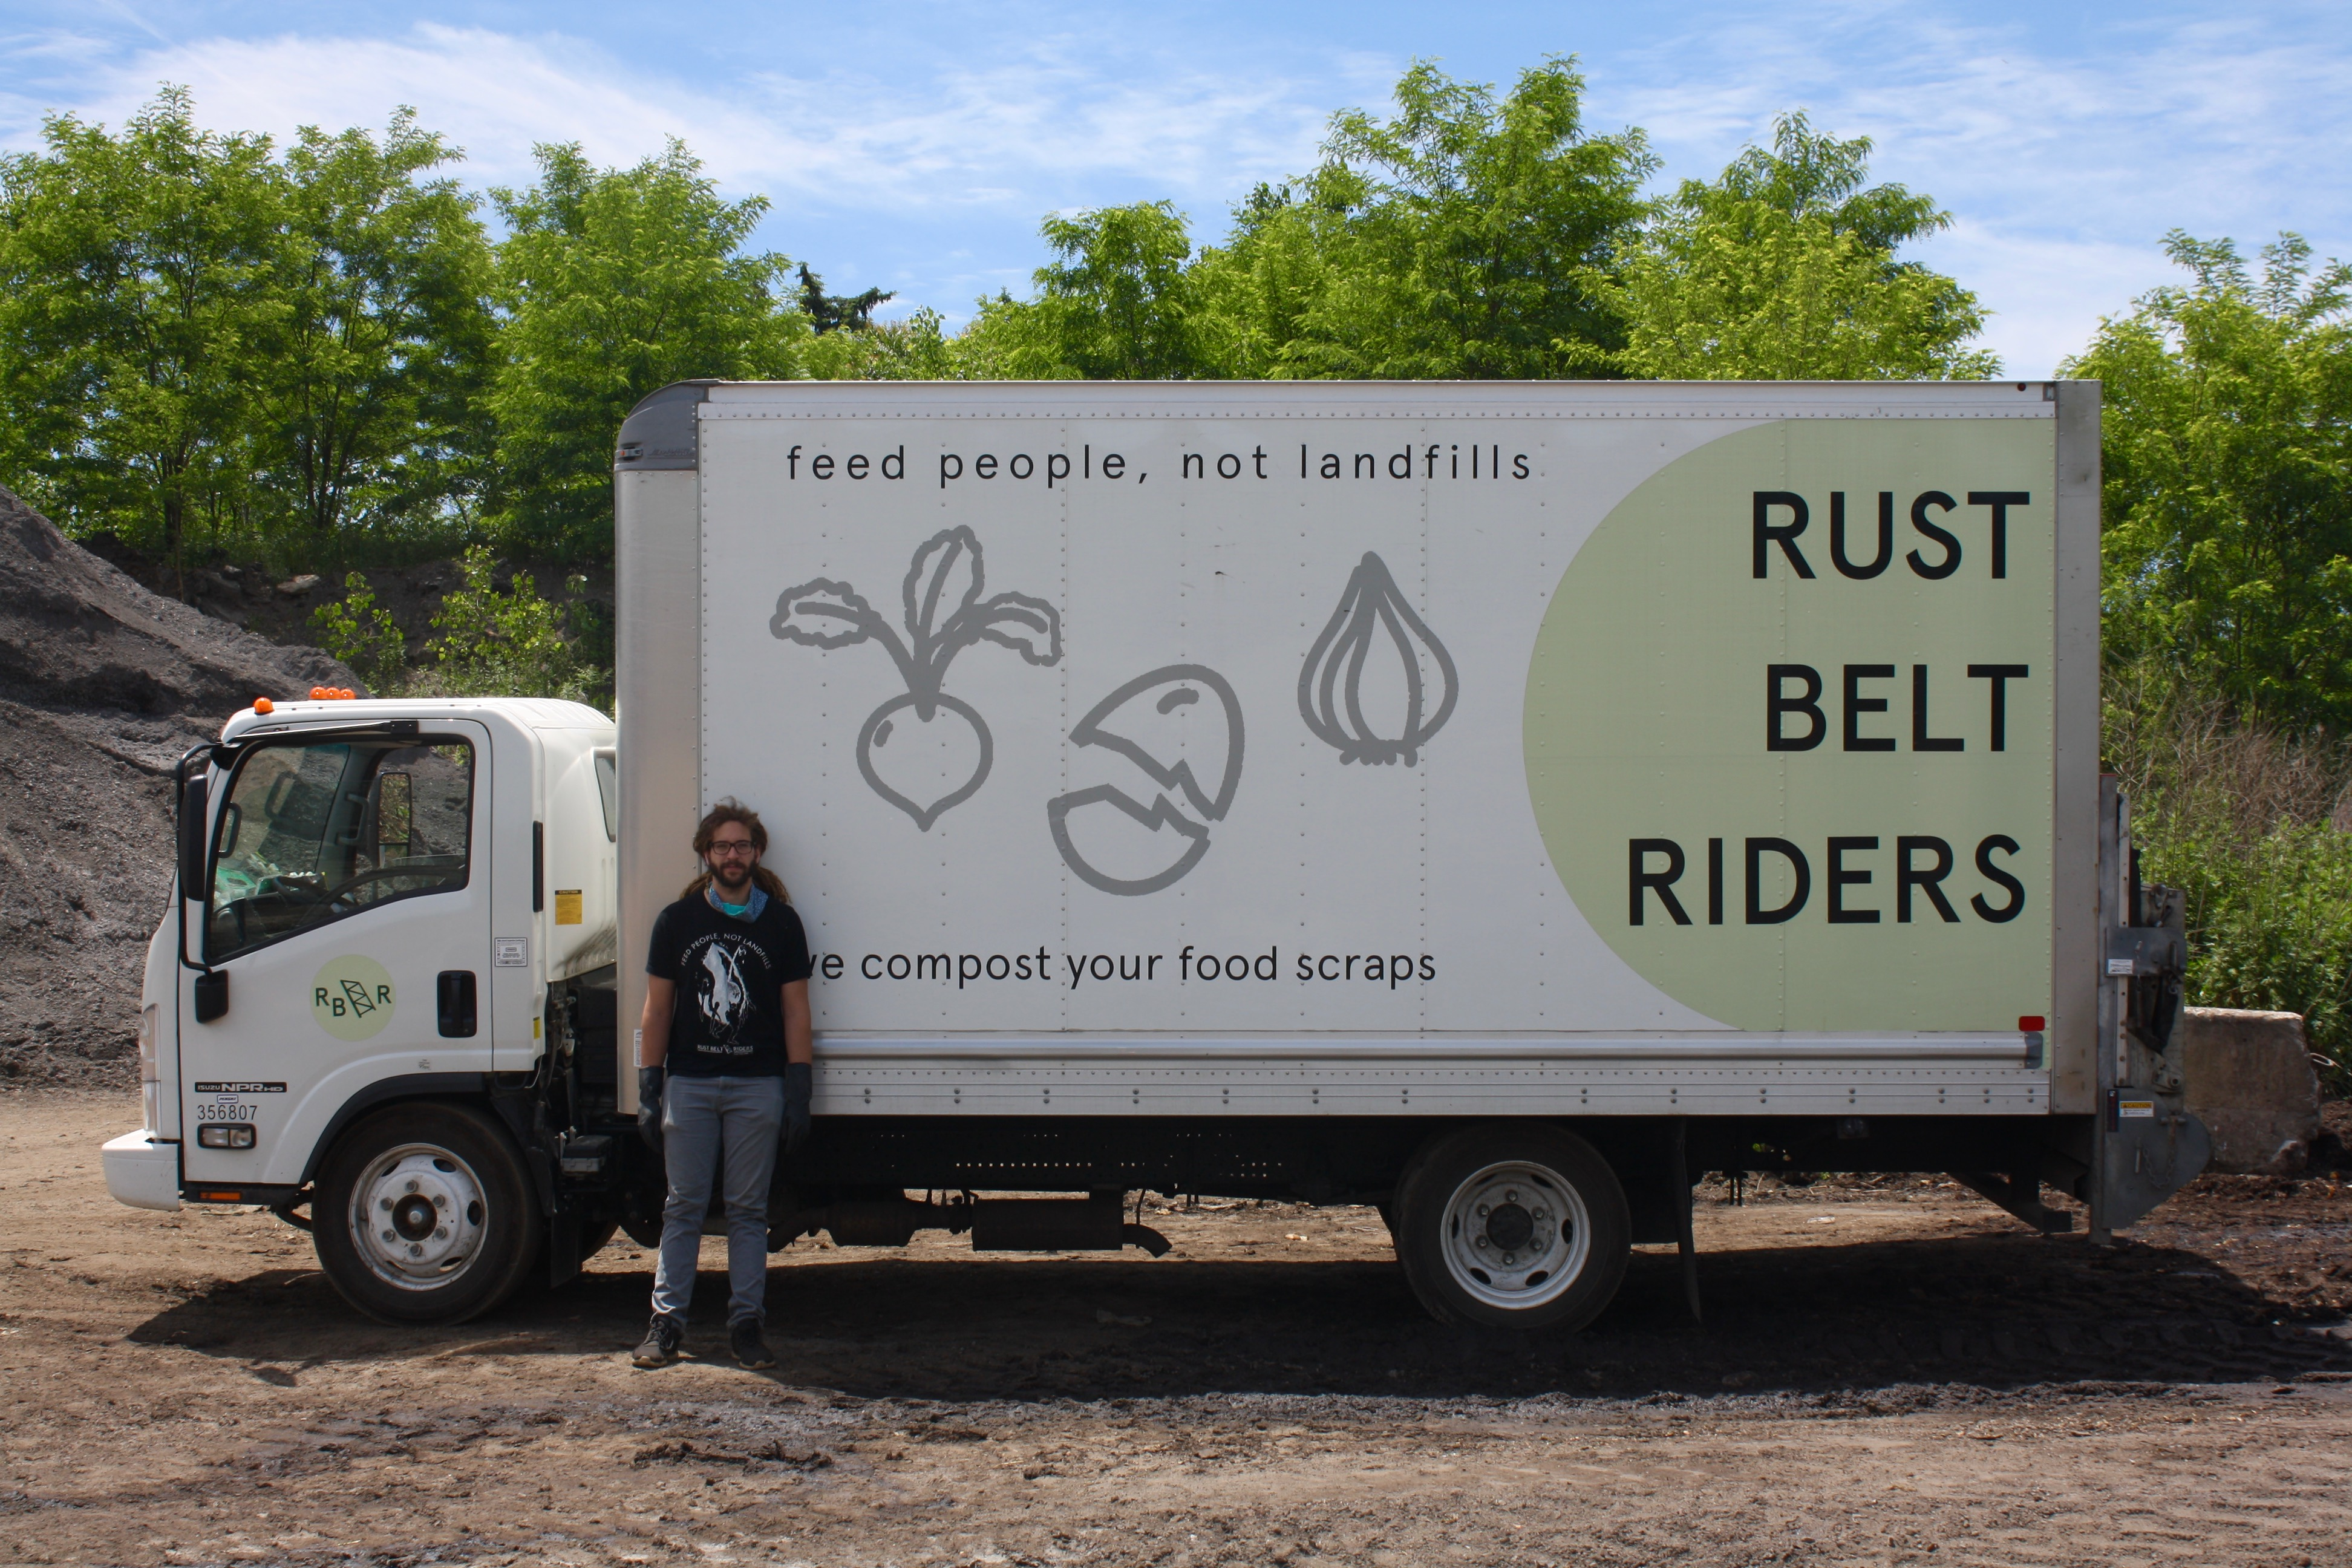 Rust Belt Riders truck